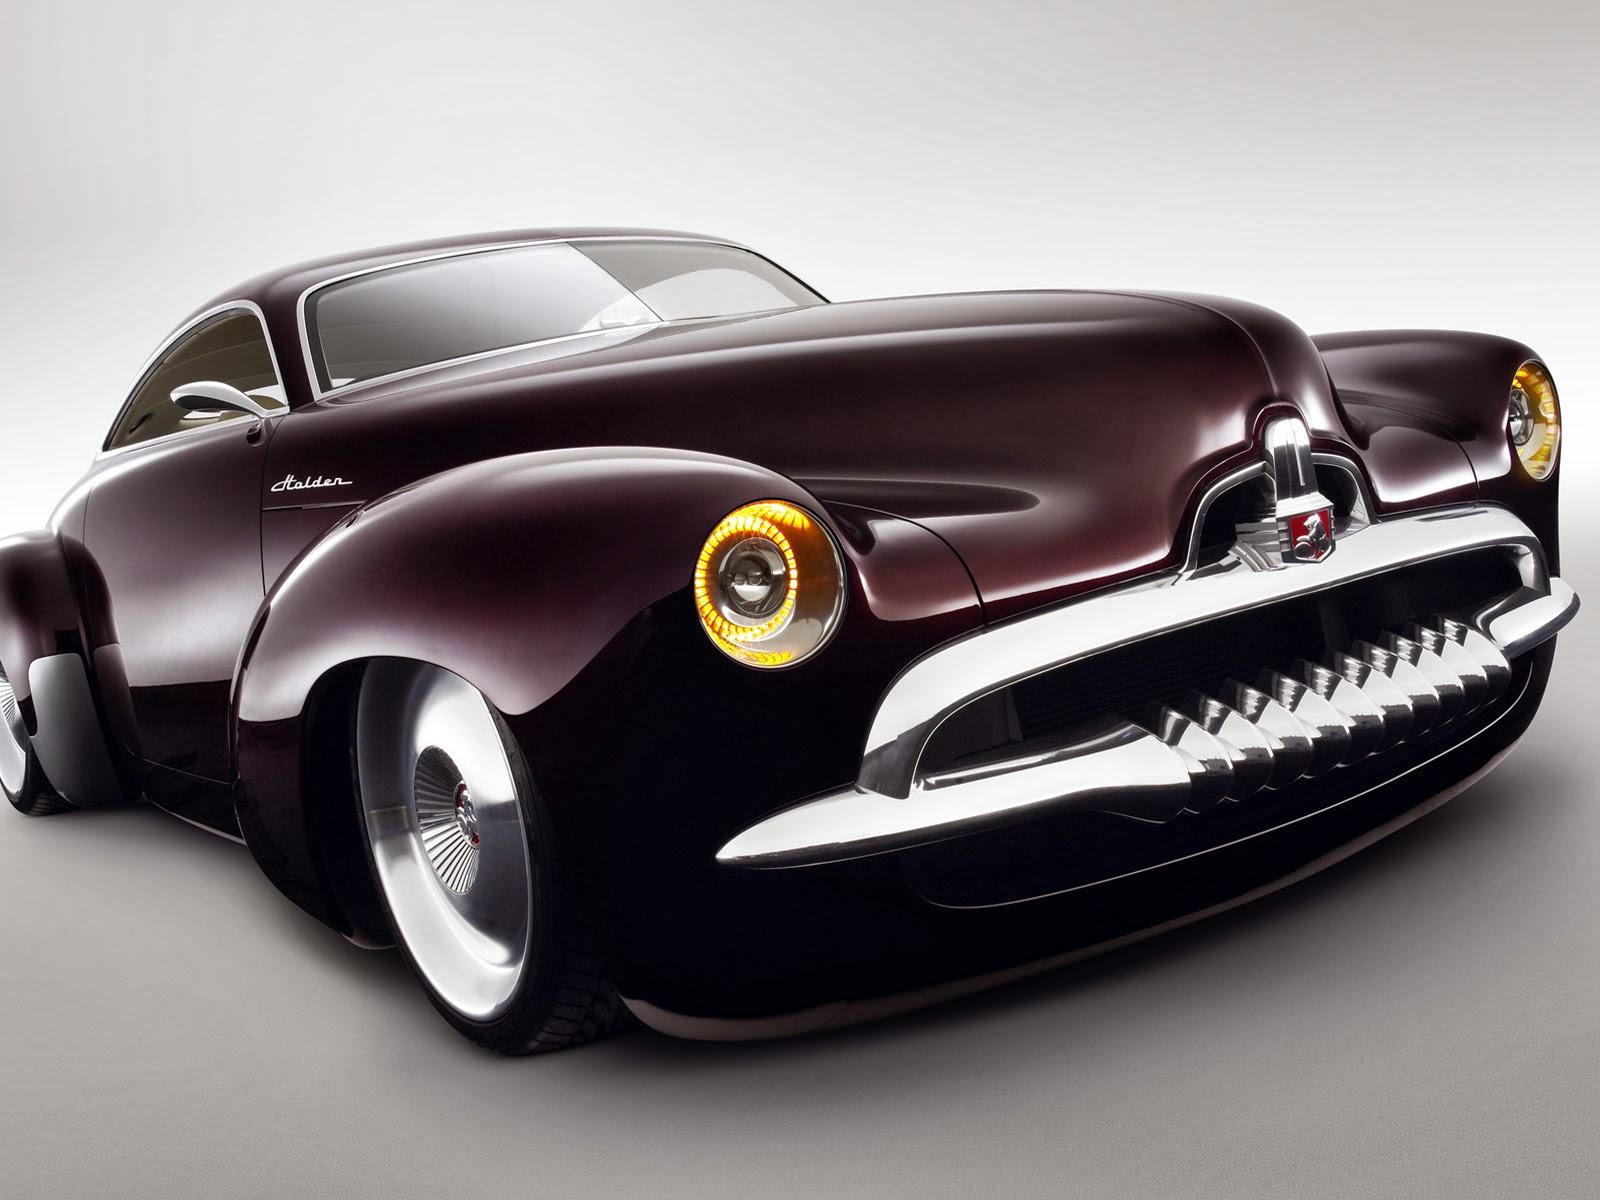 Elegant Rush And Energy U2013 3D Car Concepts Wallpapers